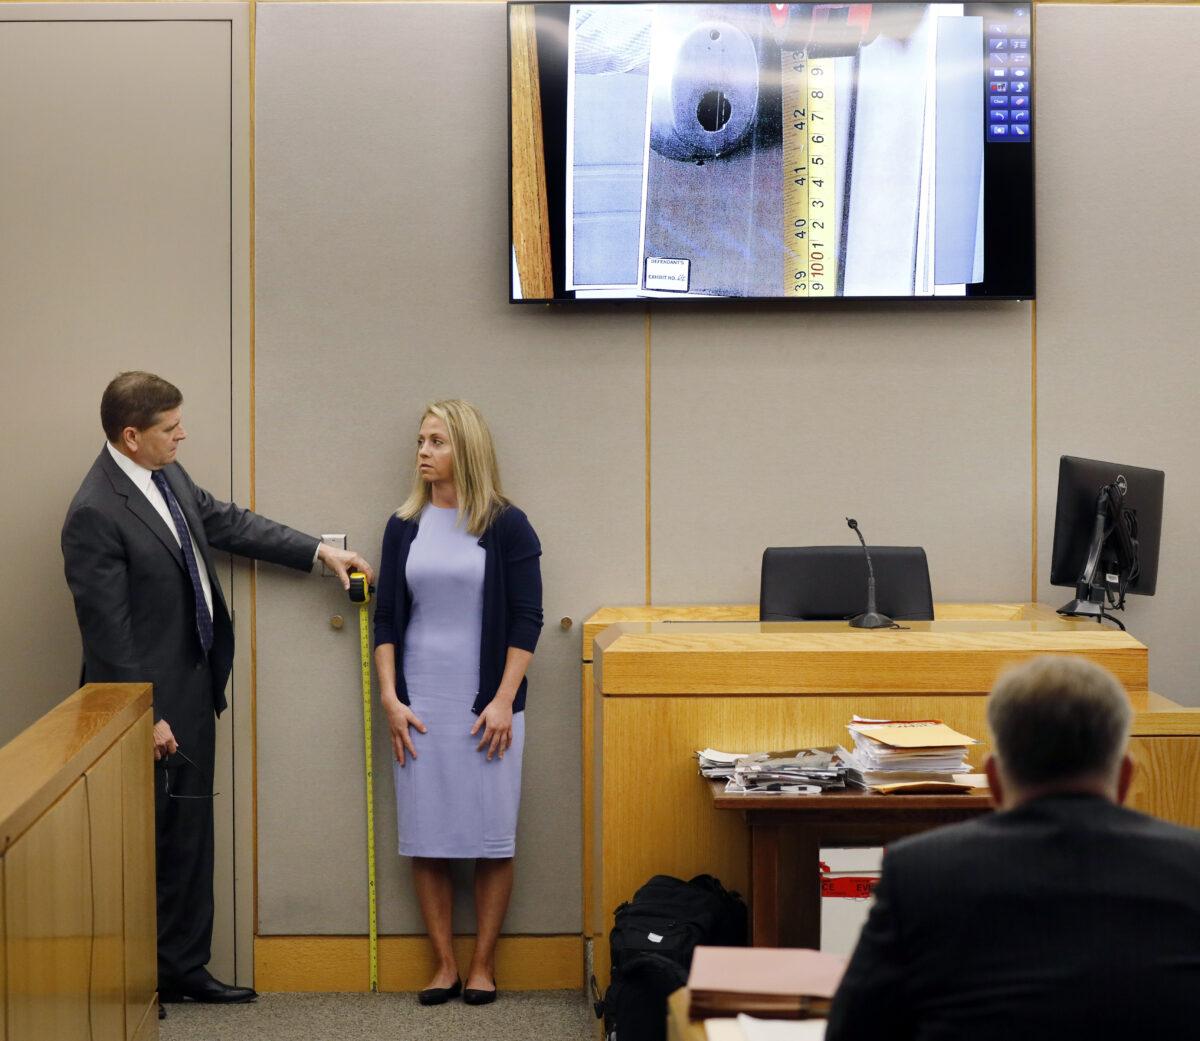 Officer cries recalling night she shot neighbor